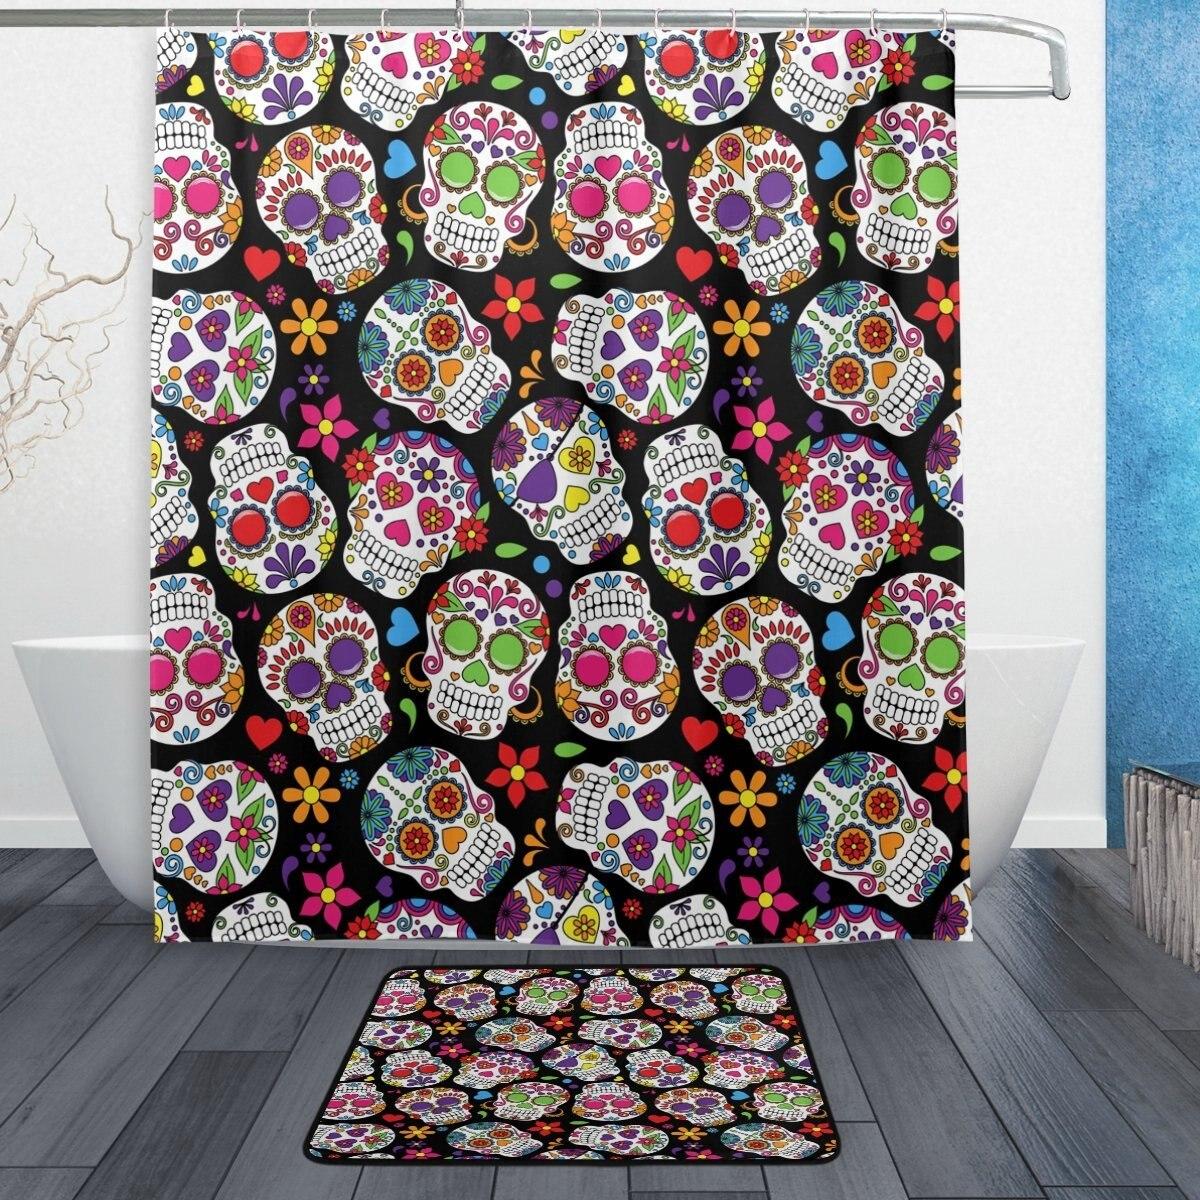 Day of Dead Colorful Flower Sugar Skull Waterproof Polyester Fabric Shower Curtain with Hooks Doormat Bath Floor Mat Bathroom